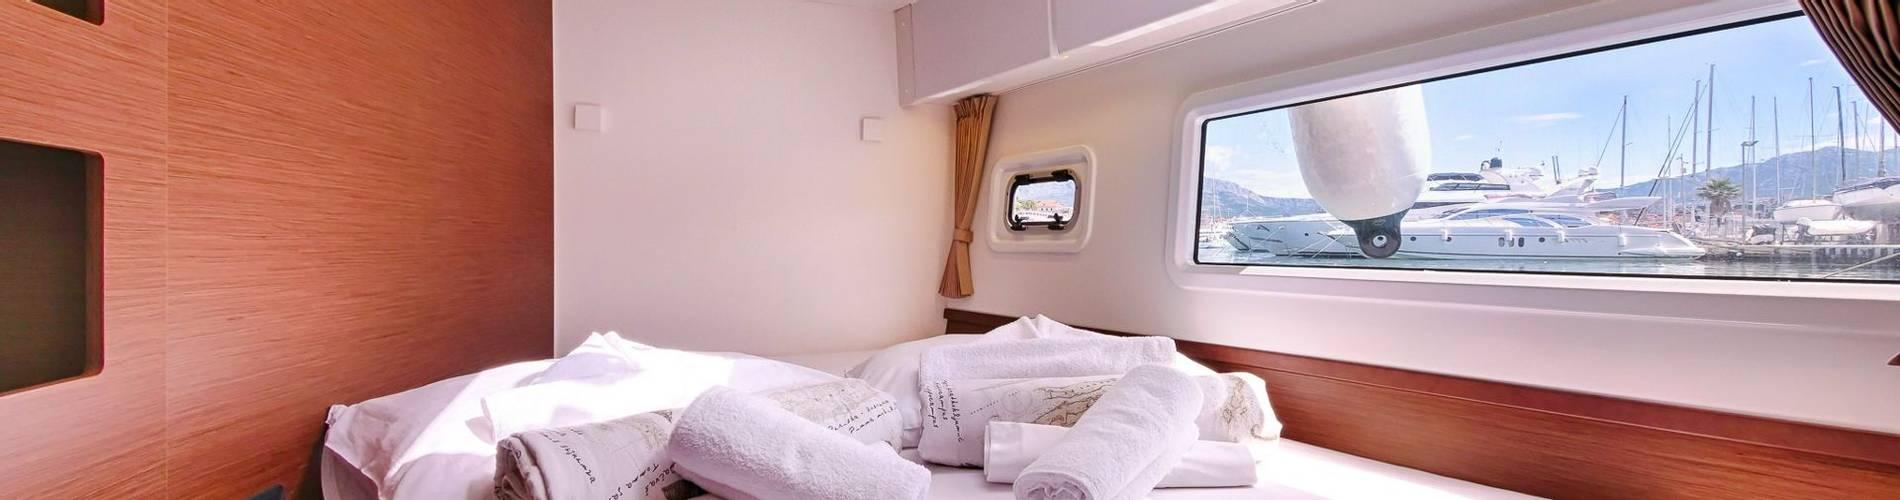 catamaran cruise 11.jpg